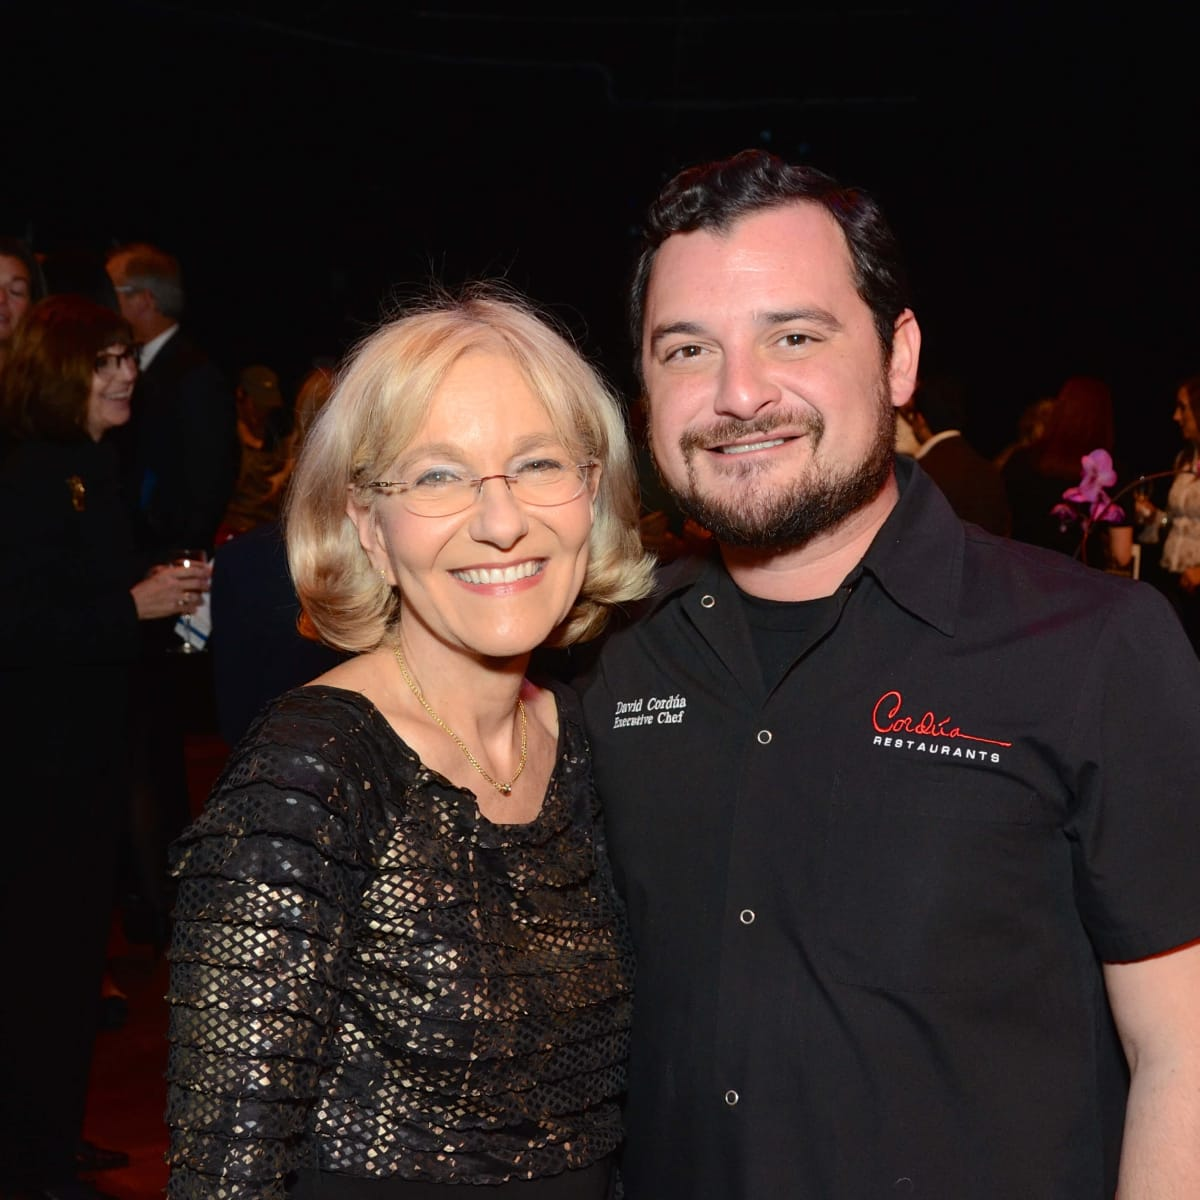 Houston, Society for Performing Arts gala, Nov. 2016, Teresa Einhorn, David Cordua